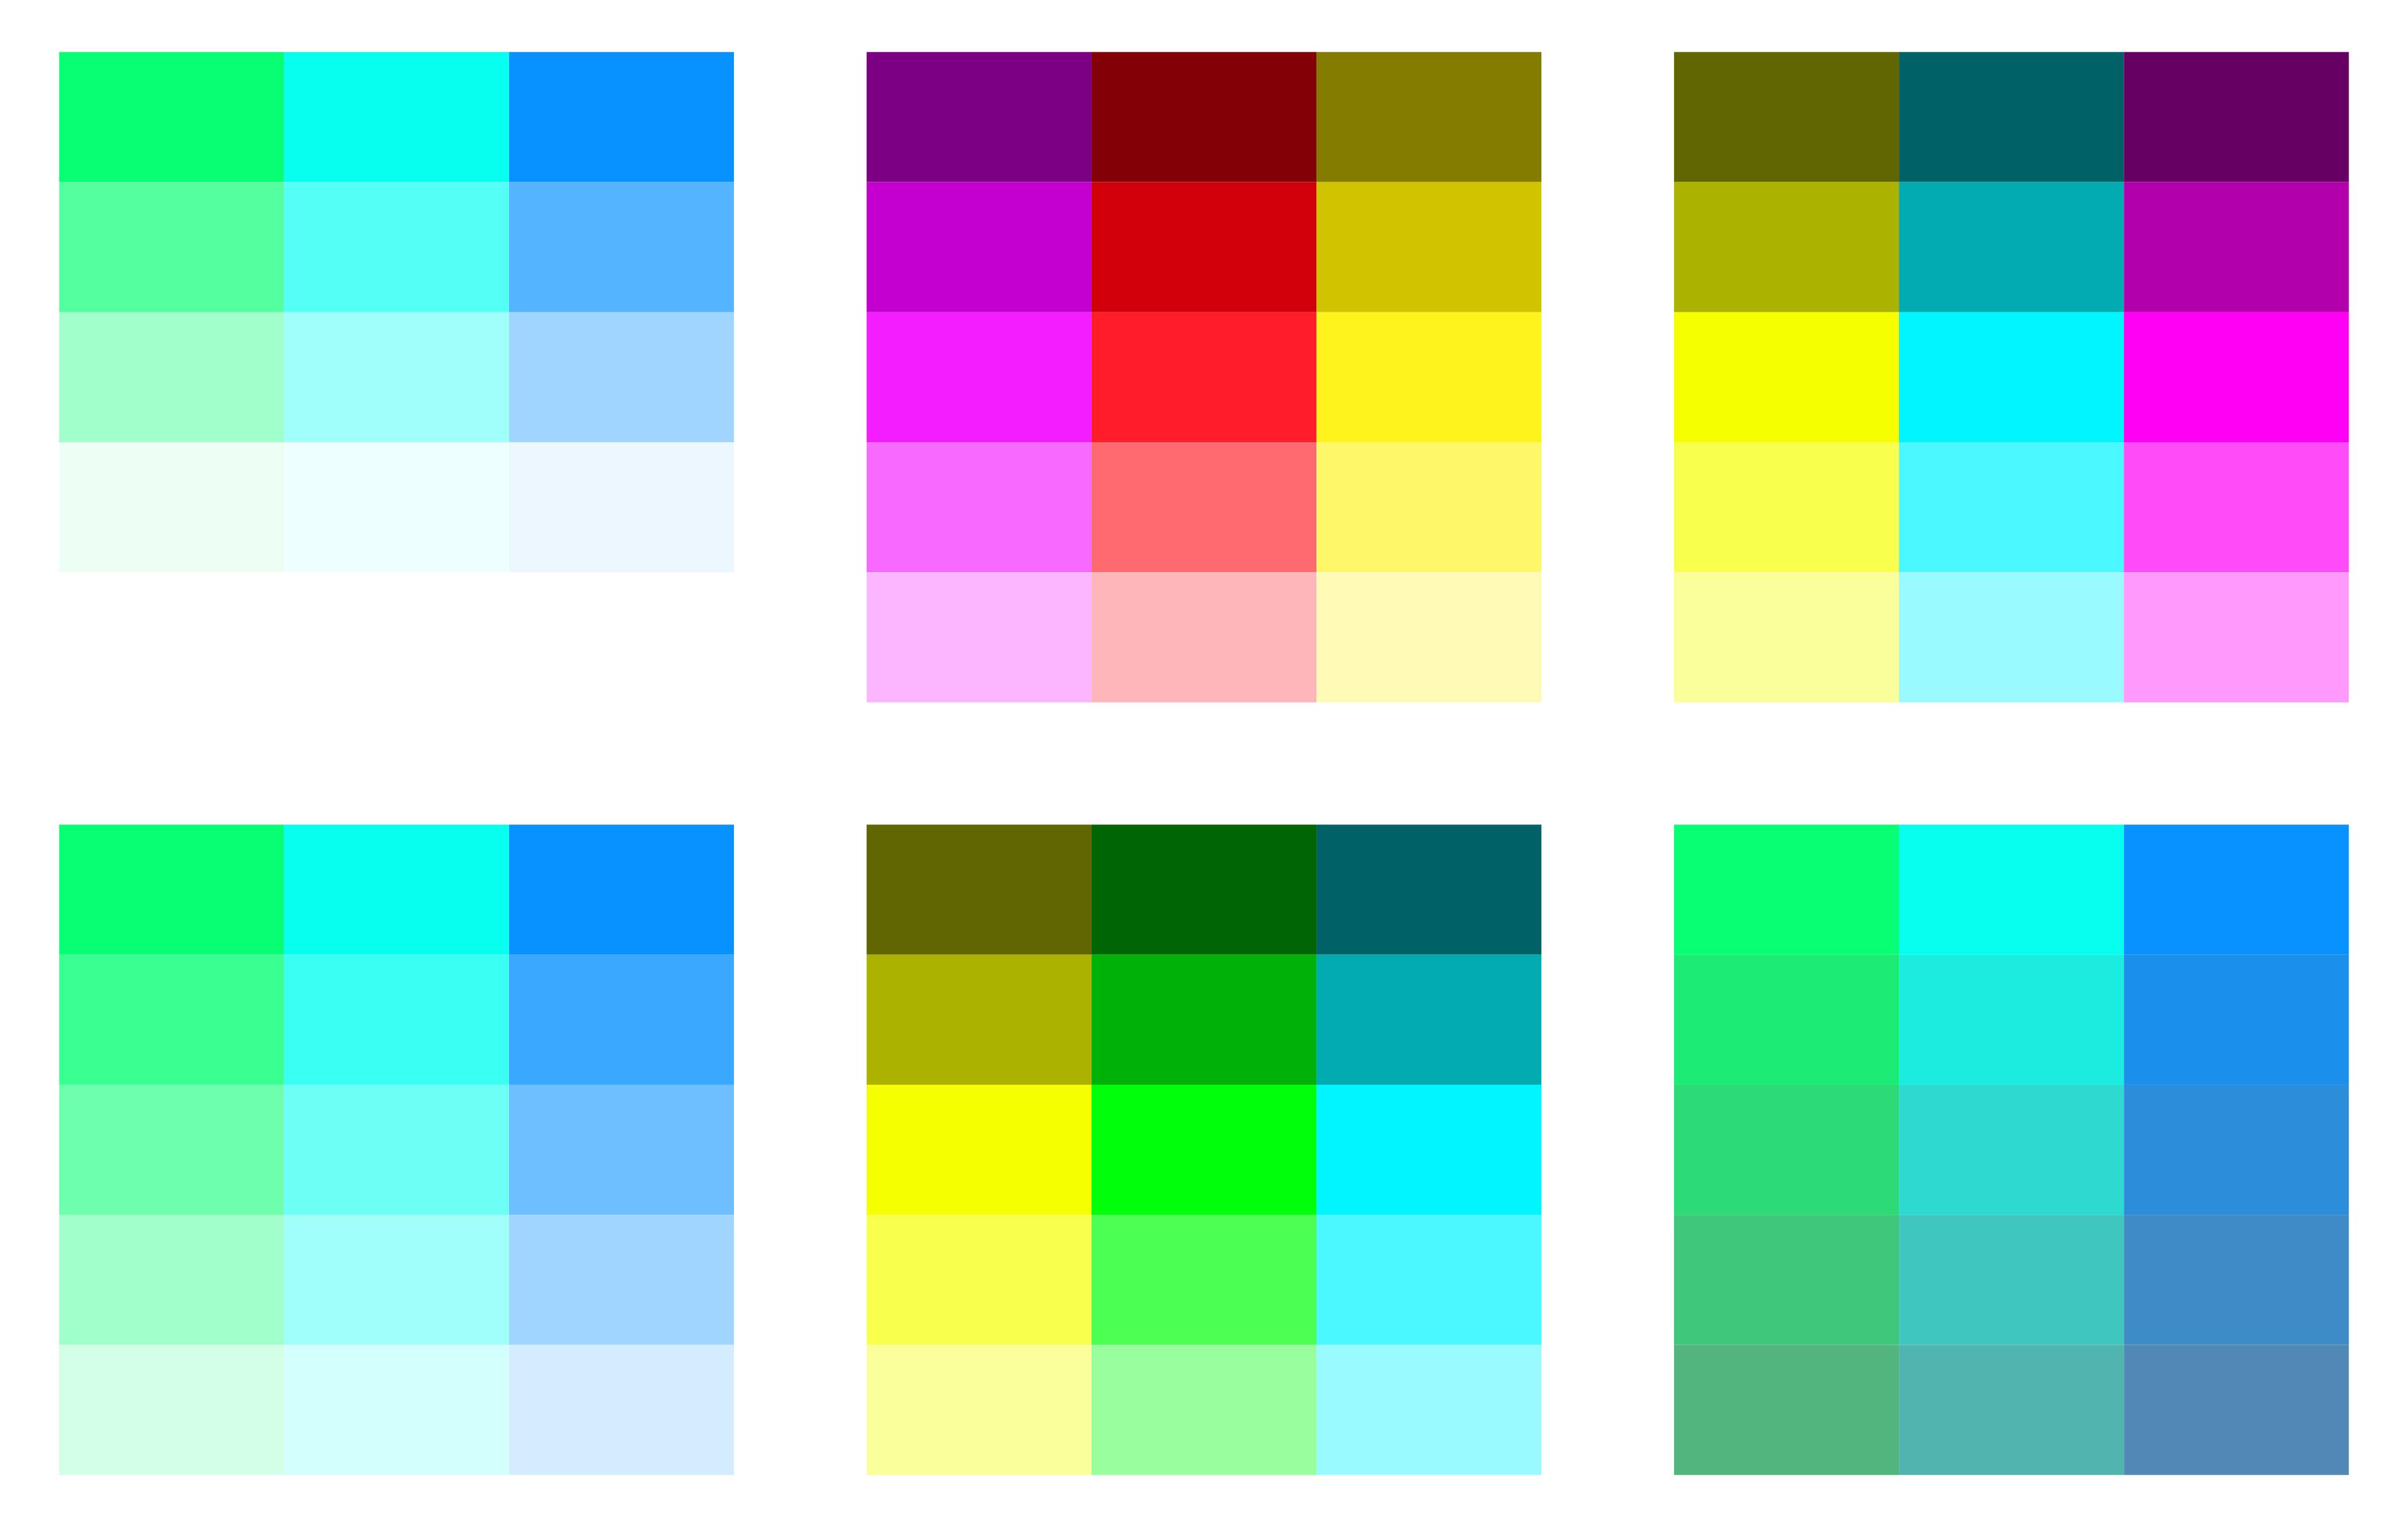 Inkscapeで配色用のカラーパレットを簡単に作る方法